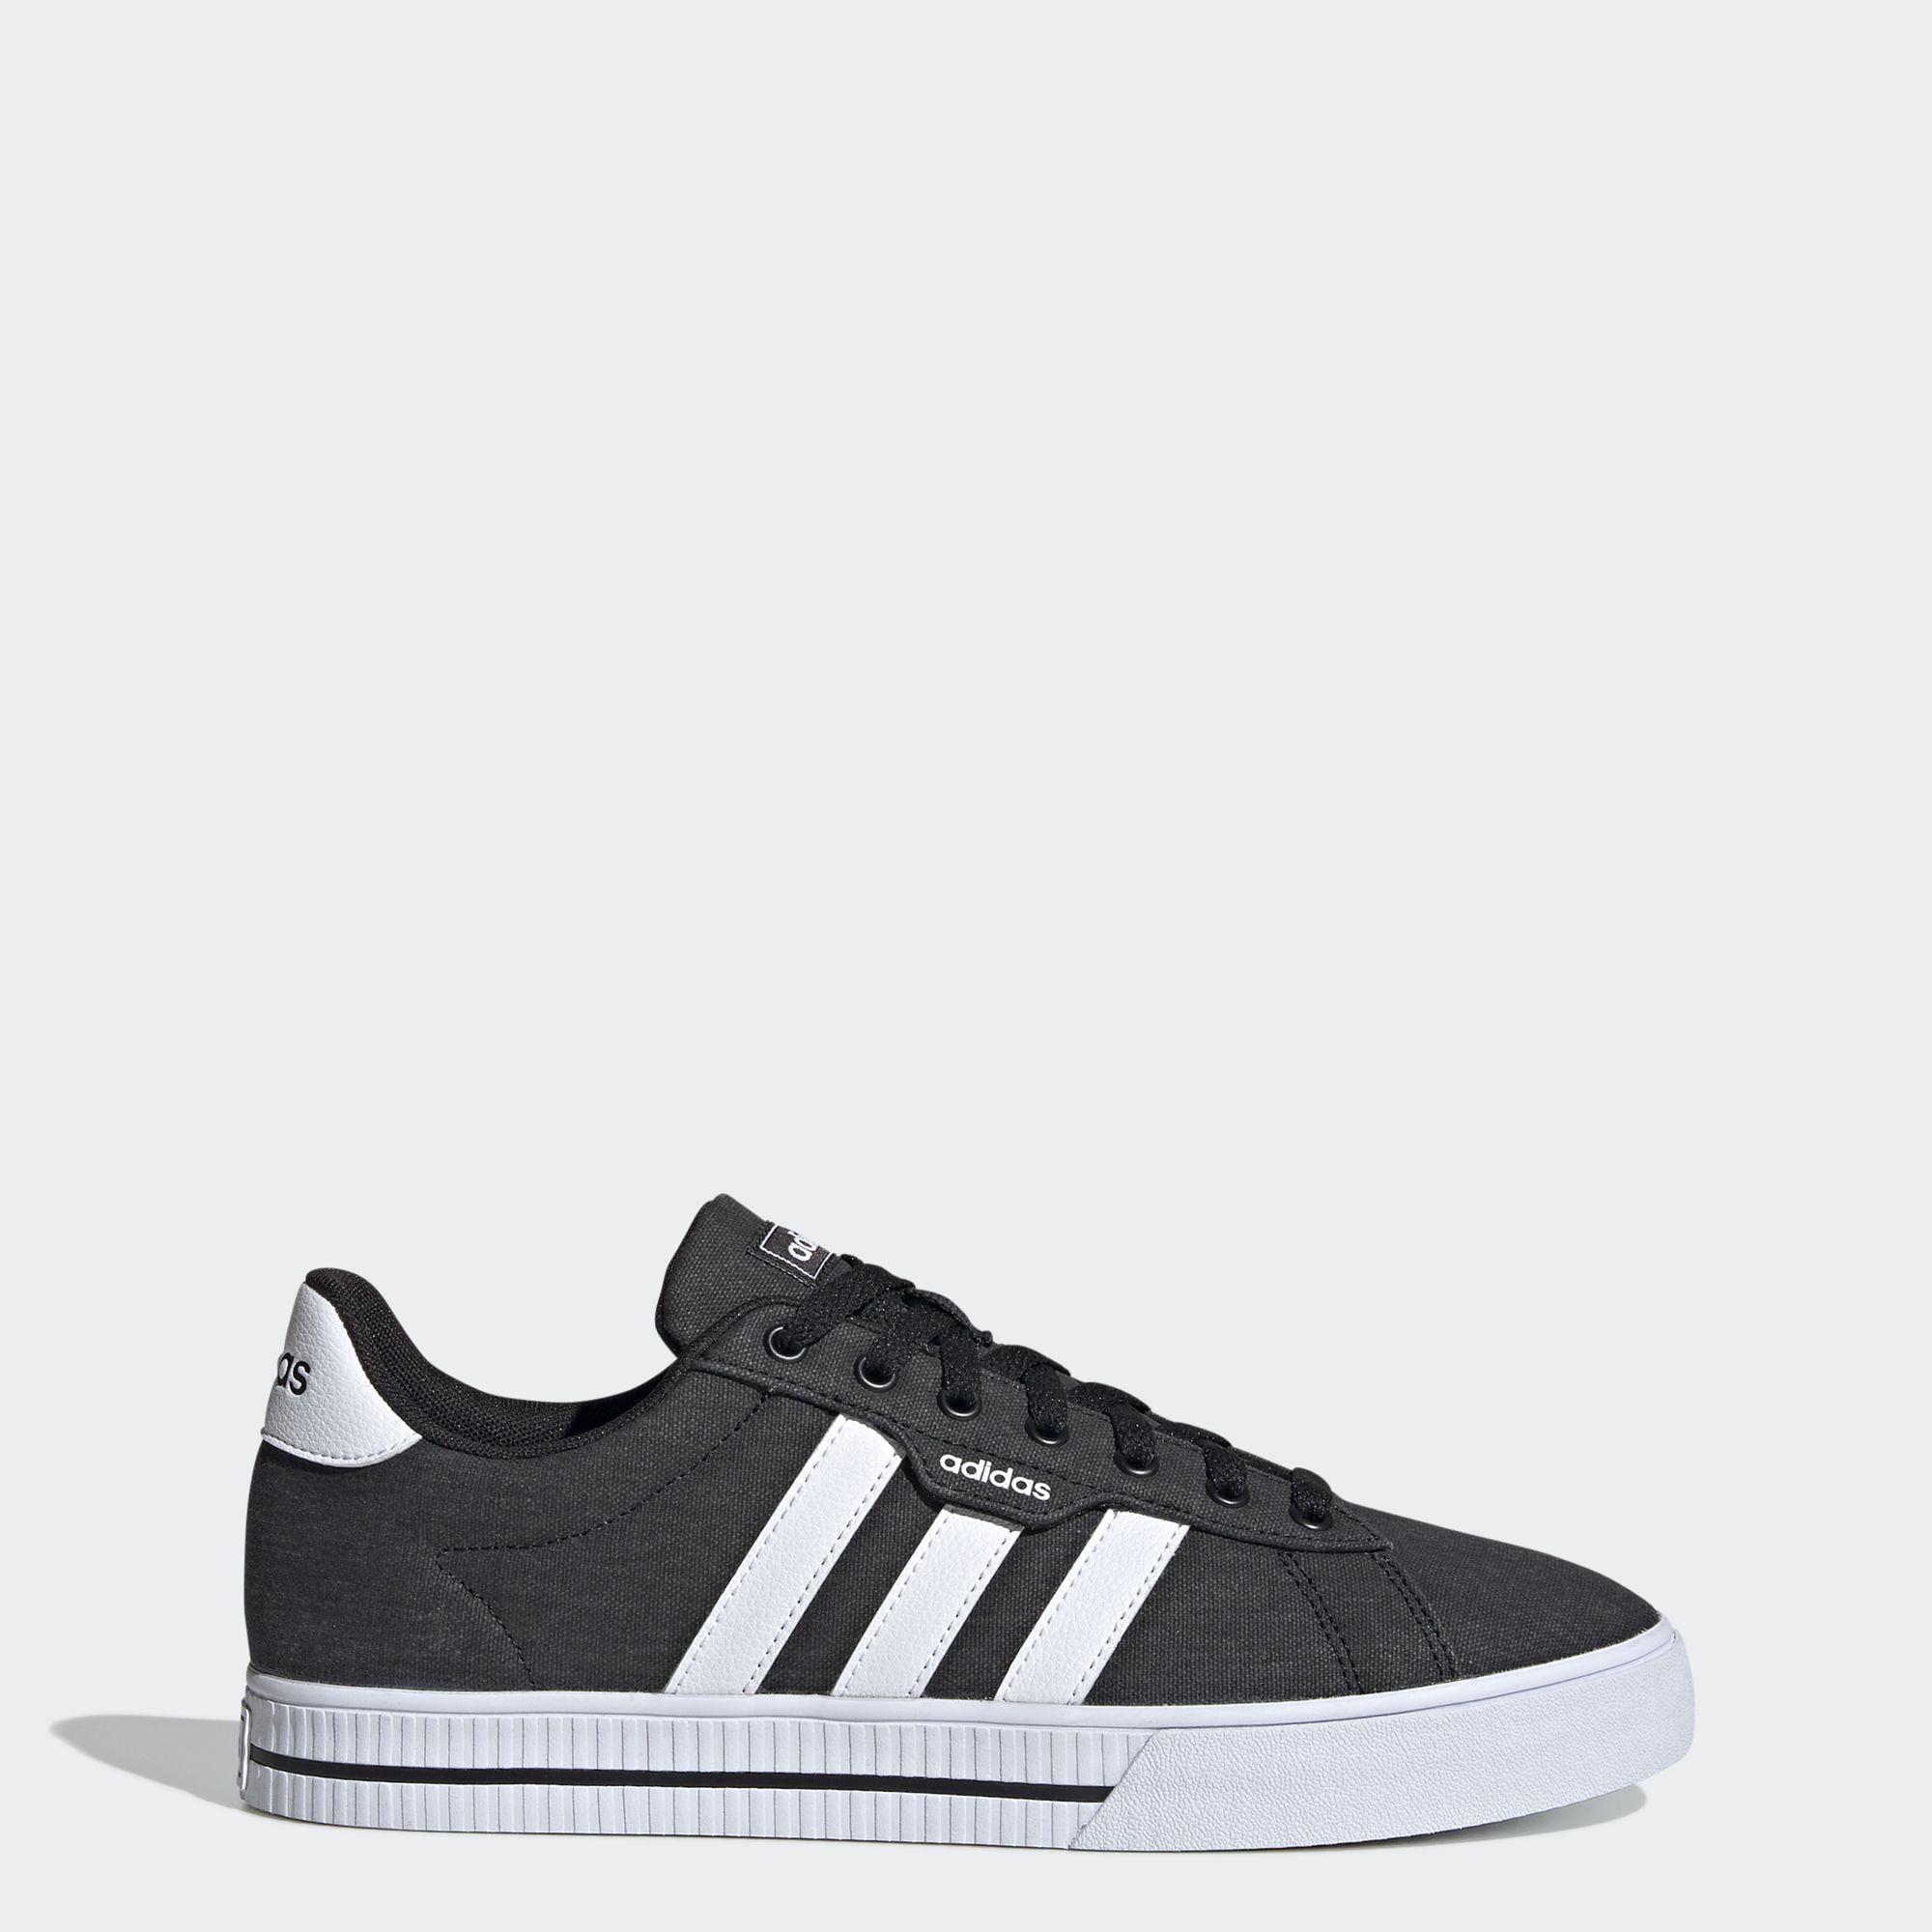 adidas shoes for men black